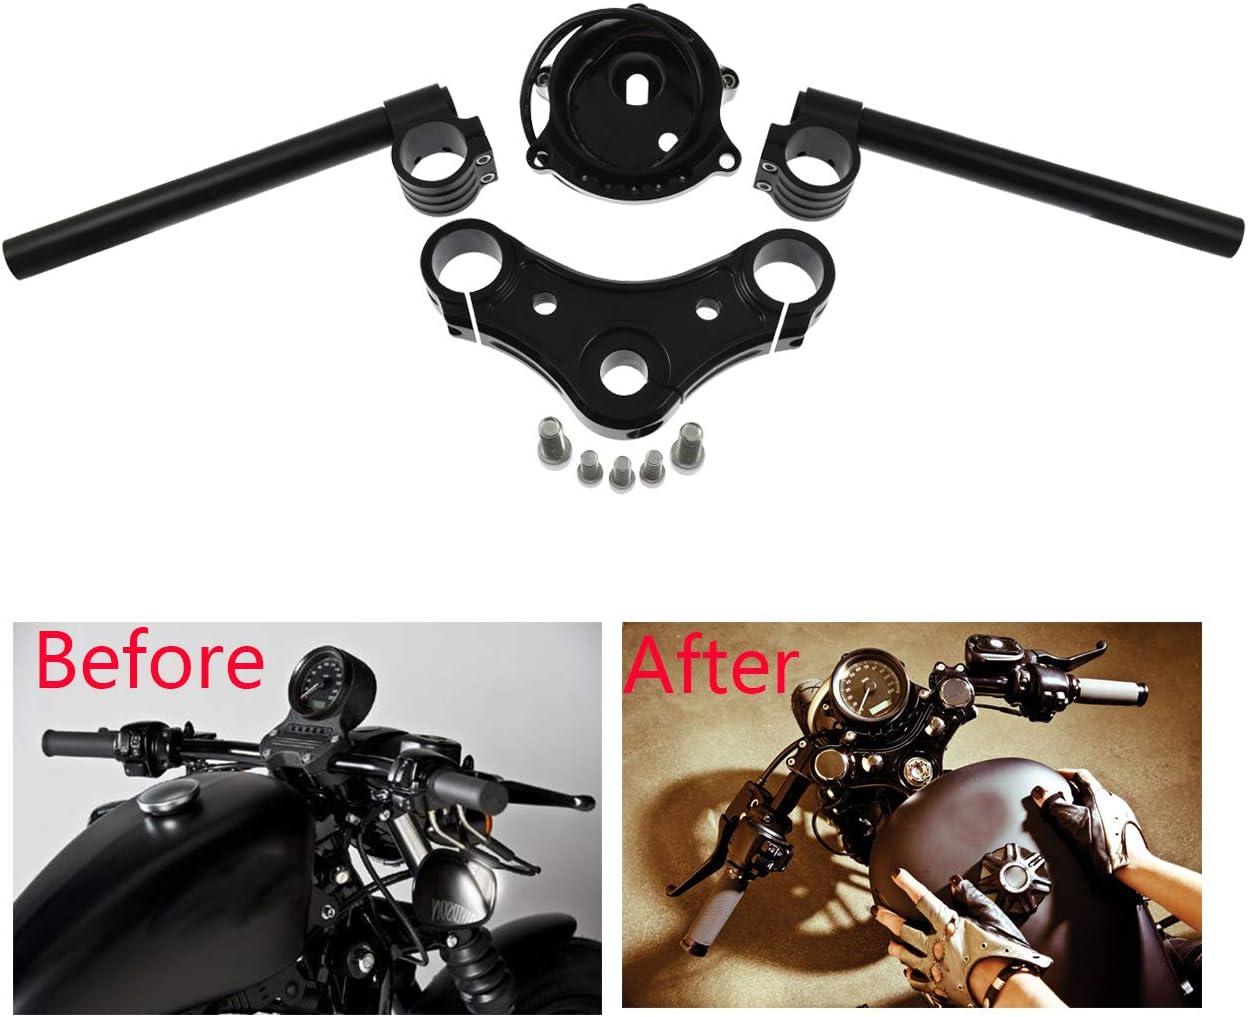 Top Triple Clamps Speedometer Gauge Bracket Clip-on Handlebar Set for Harley Sportster XL